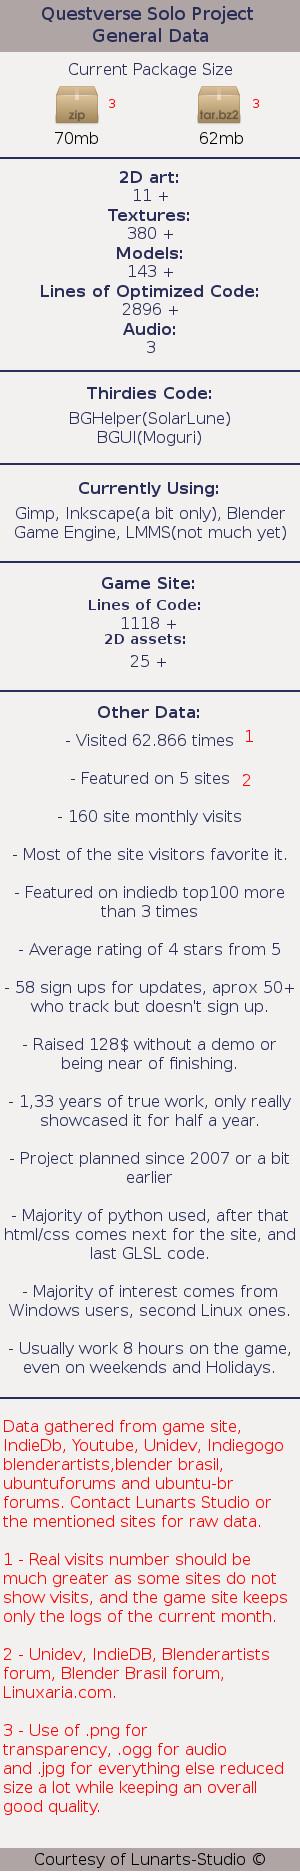 Questverse Project Stats